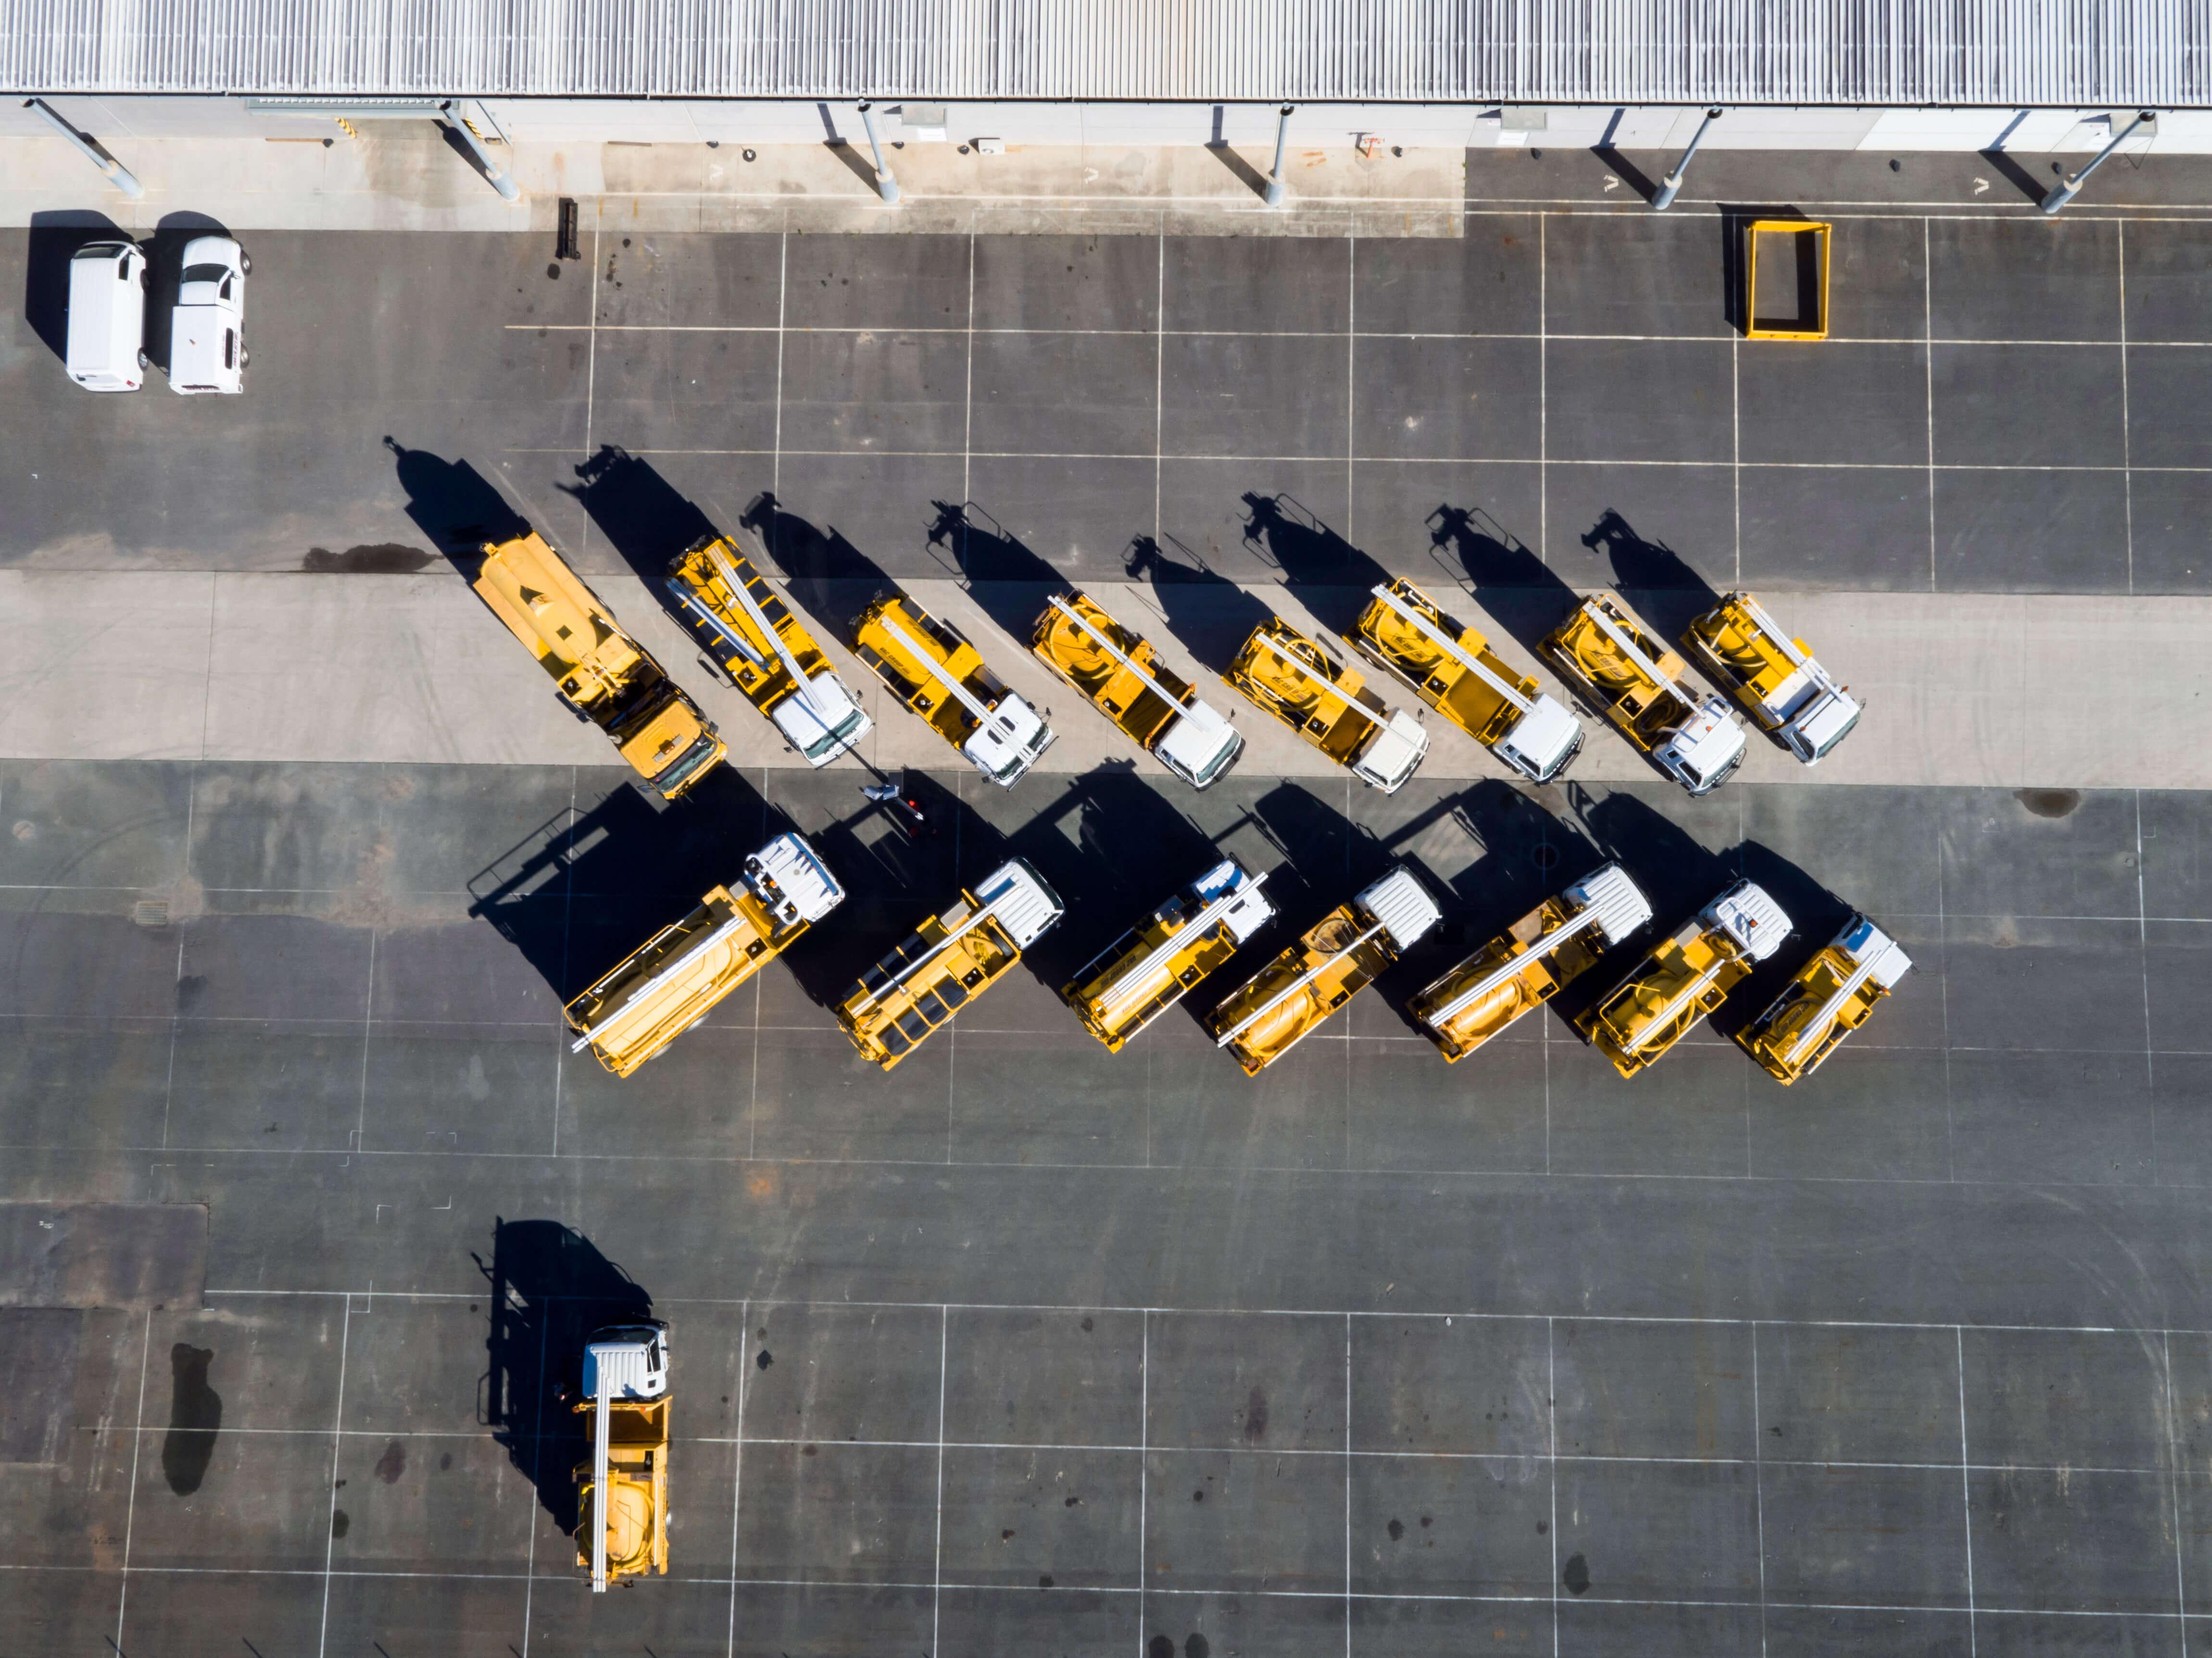 Vac-truck-hire-melbourne